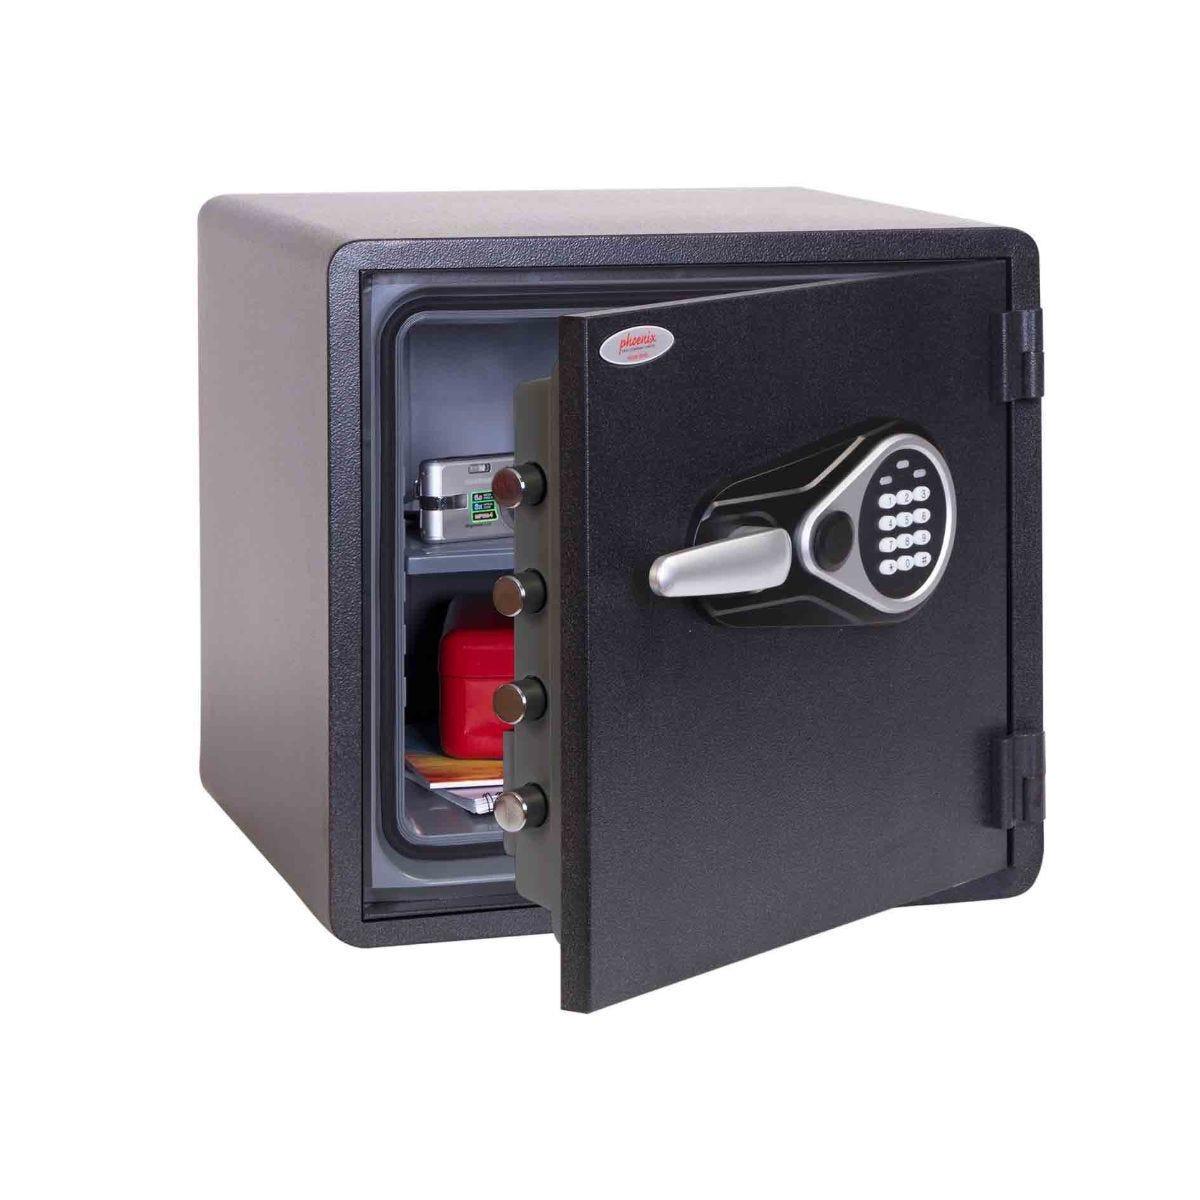 Phoenix Titan Aqua FS1292E Water Fire  Security Safe with Electronic Lock Size 2